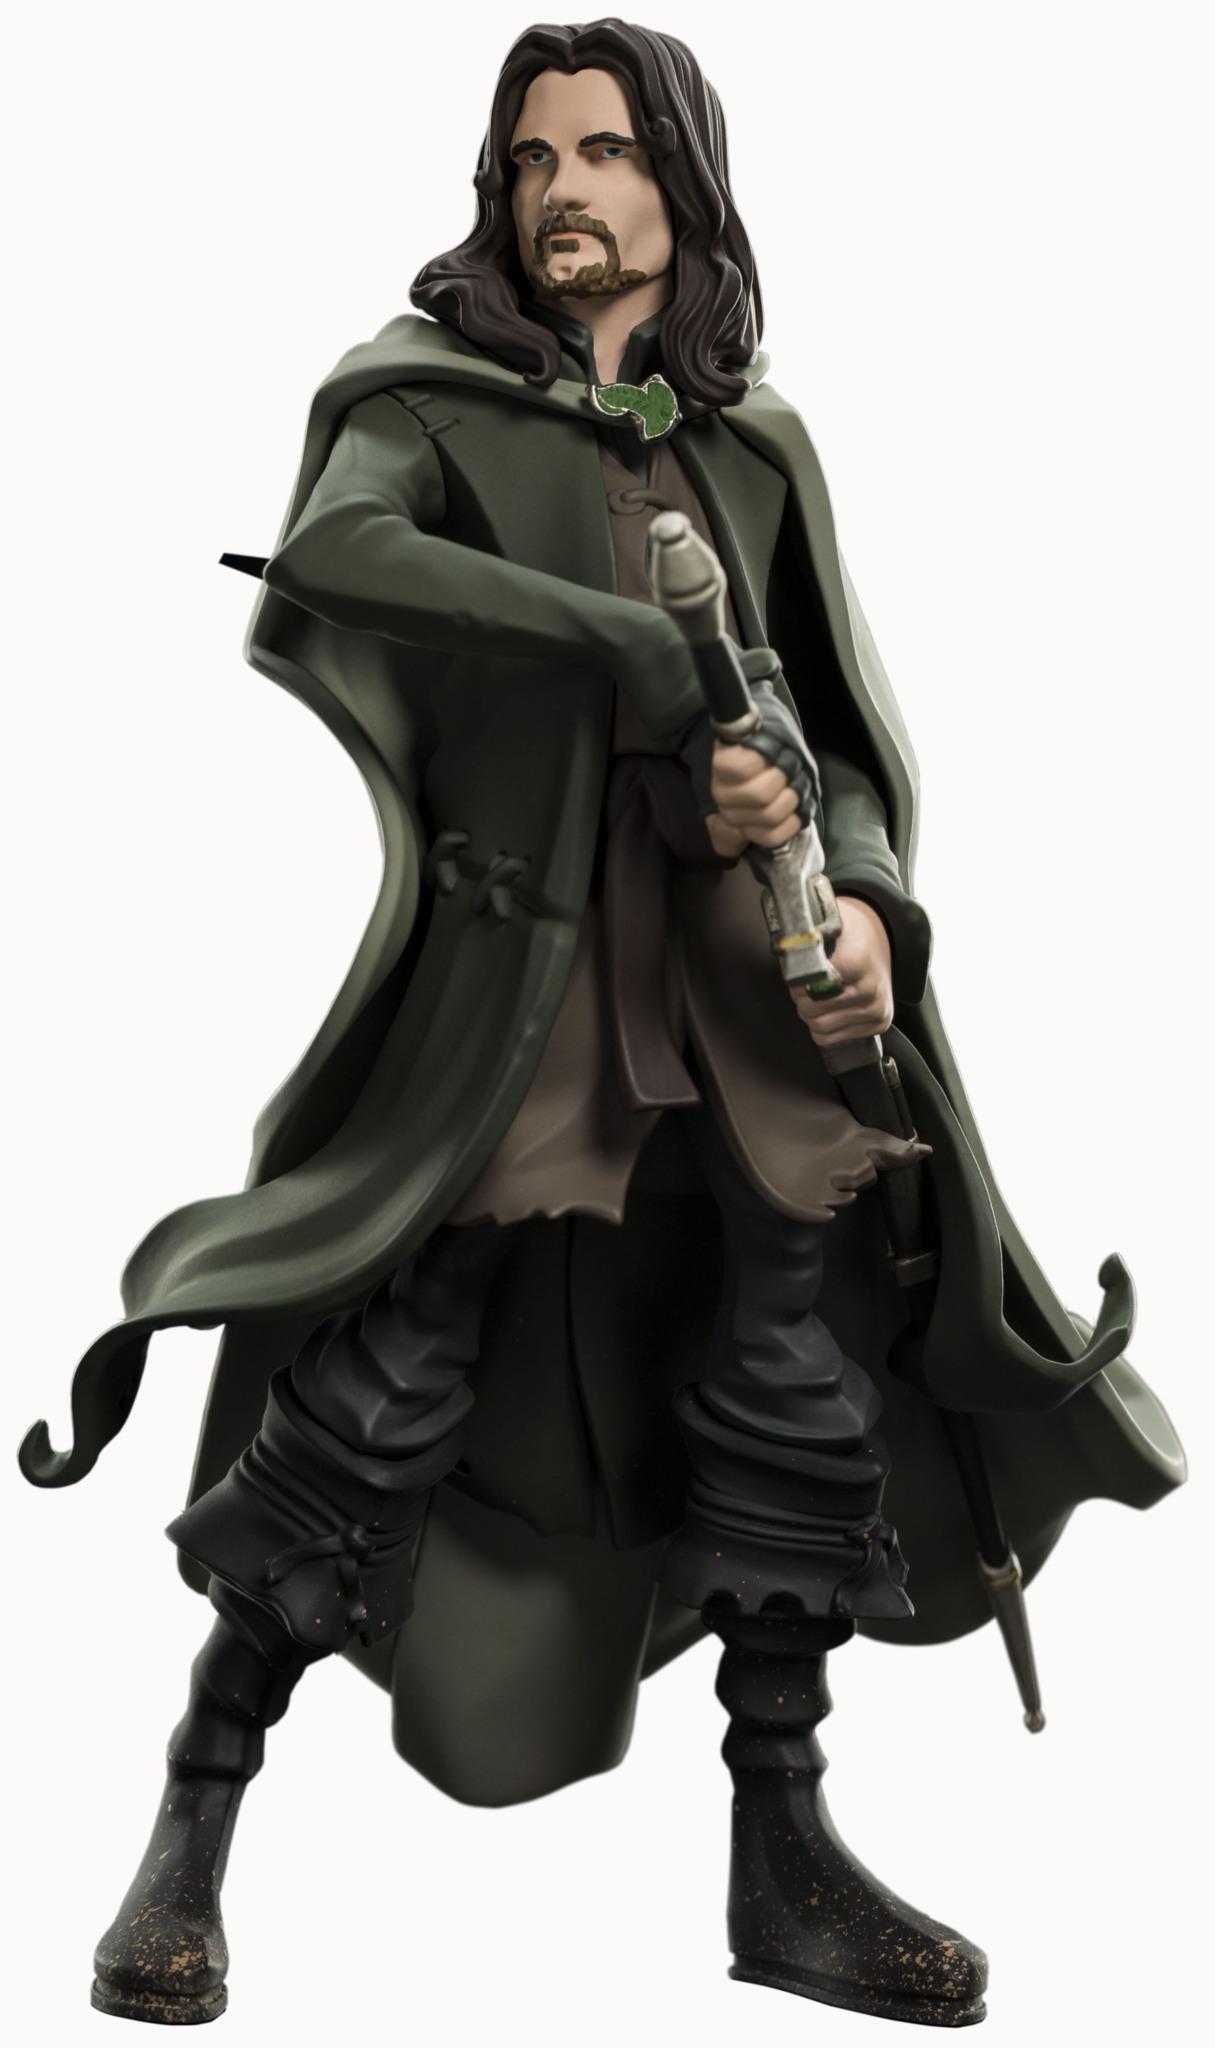 Lord of the Rings Mini Epics - Aragorn